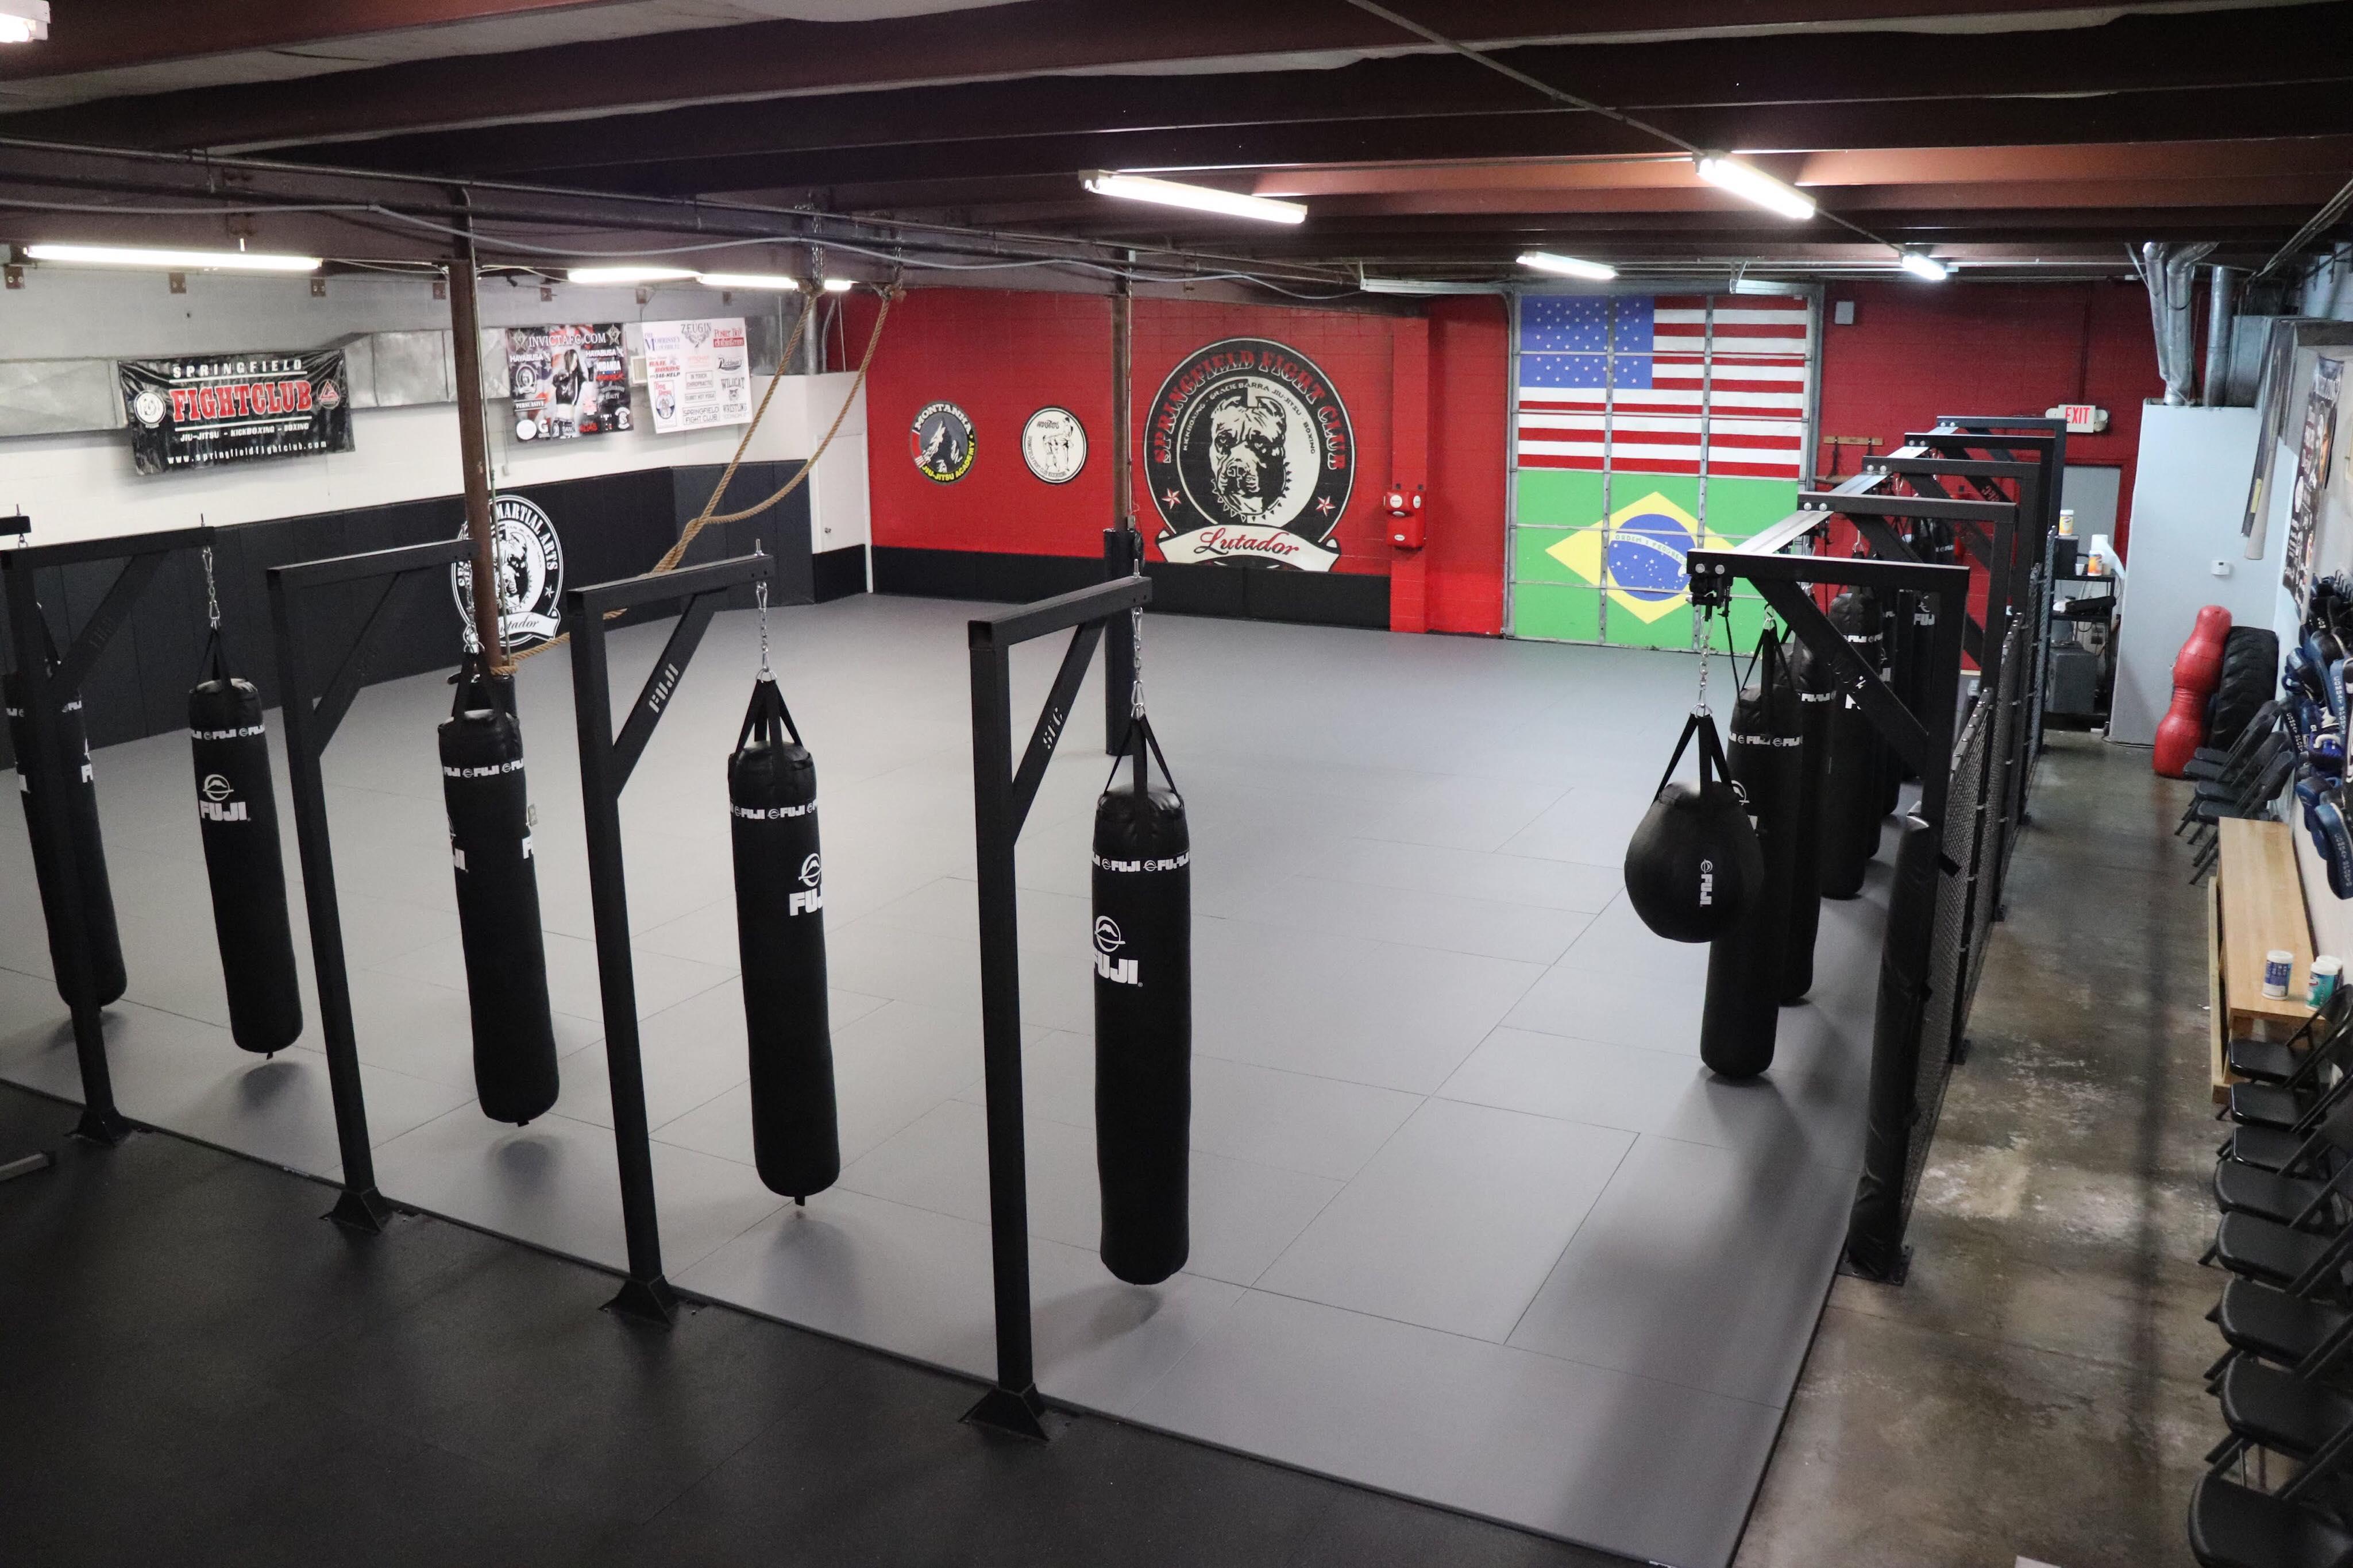 Springfield Fight Club facilities